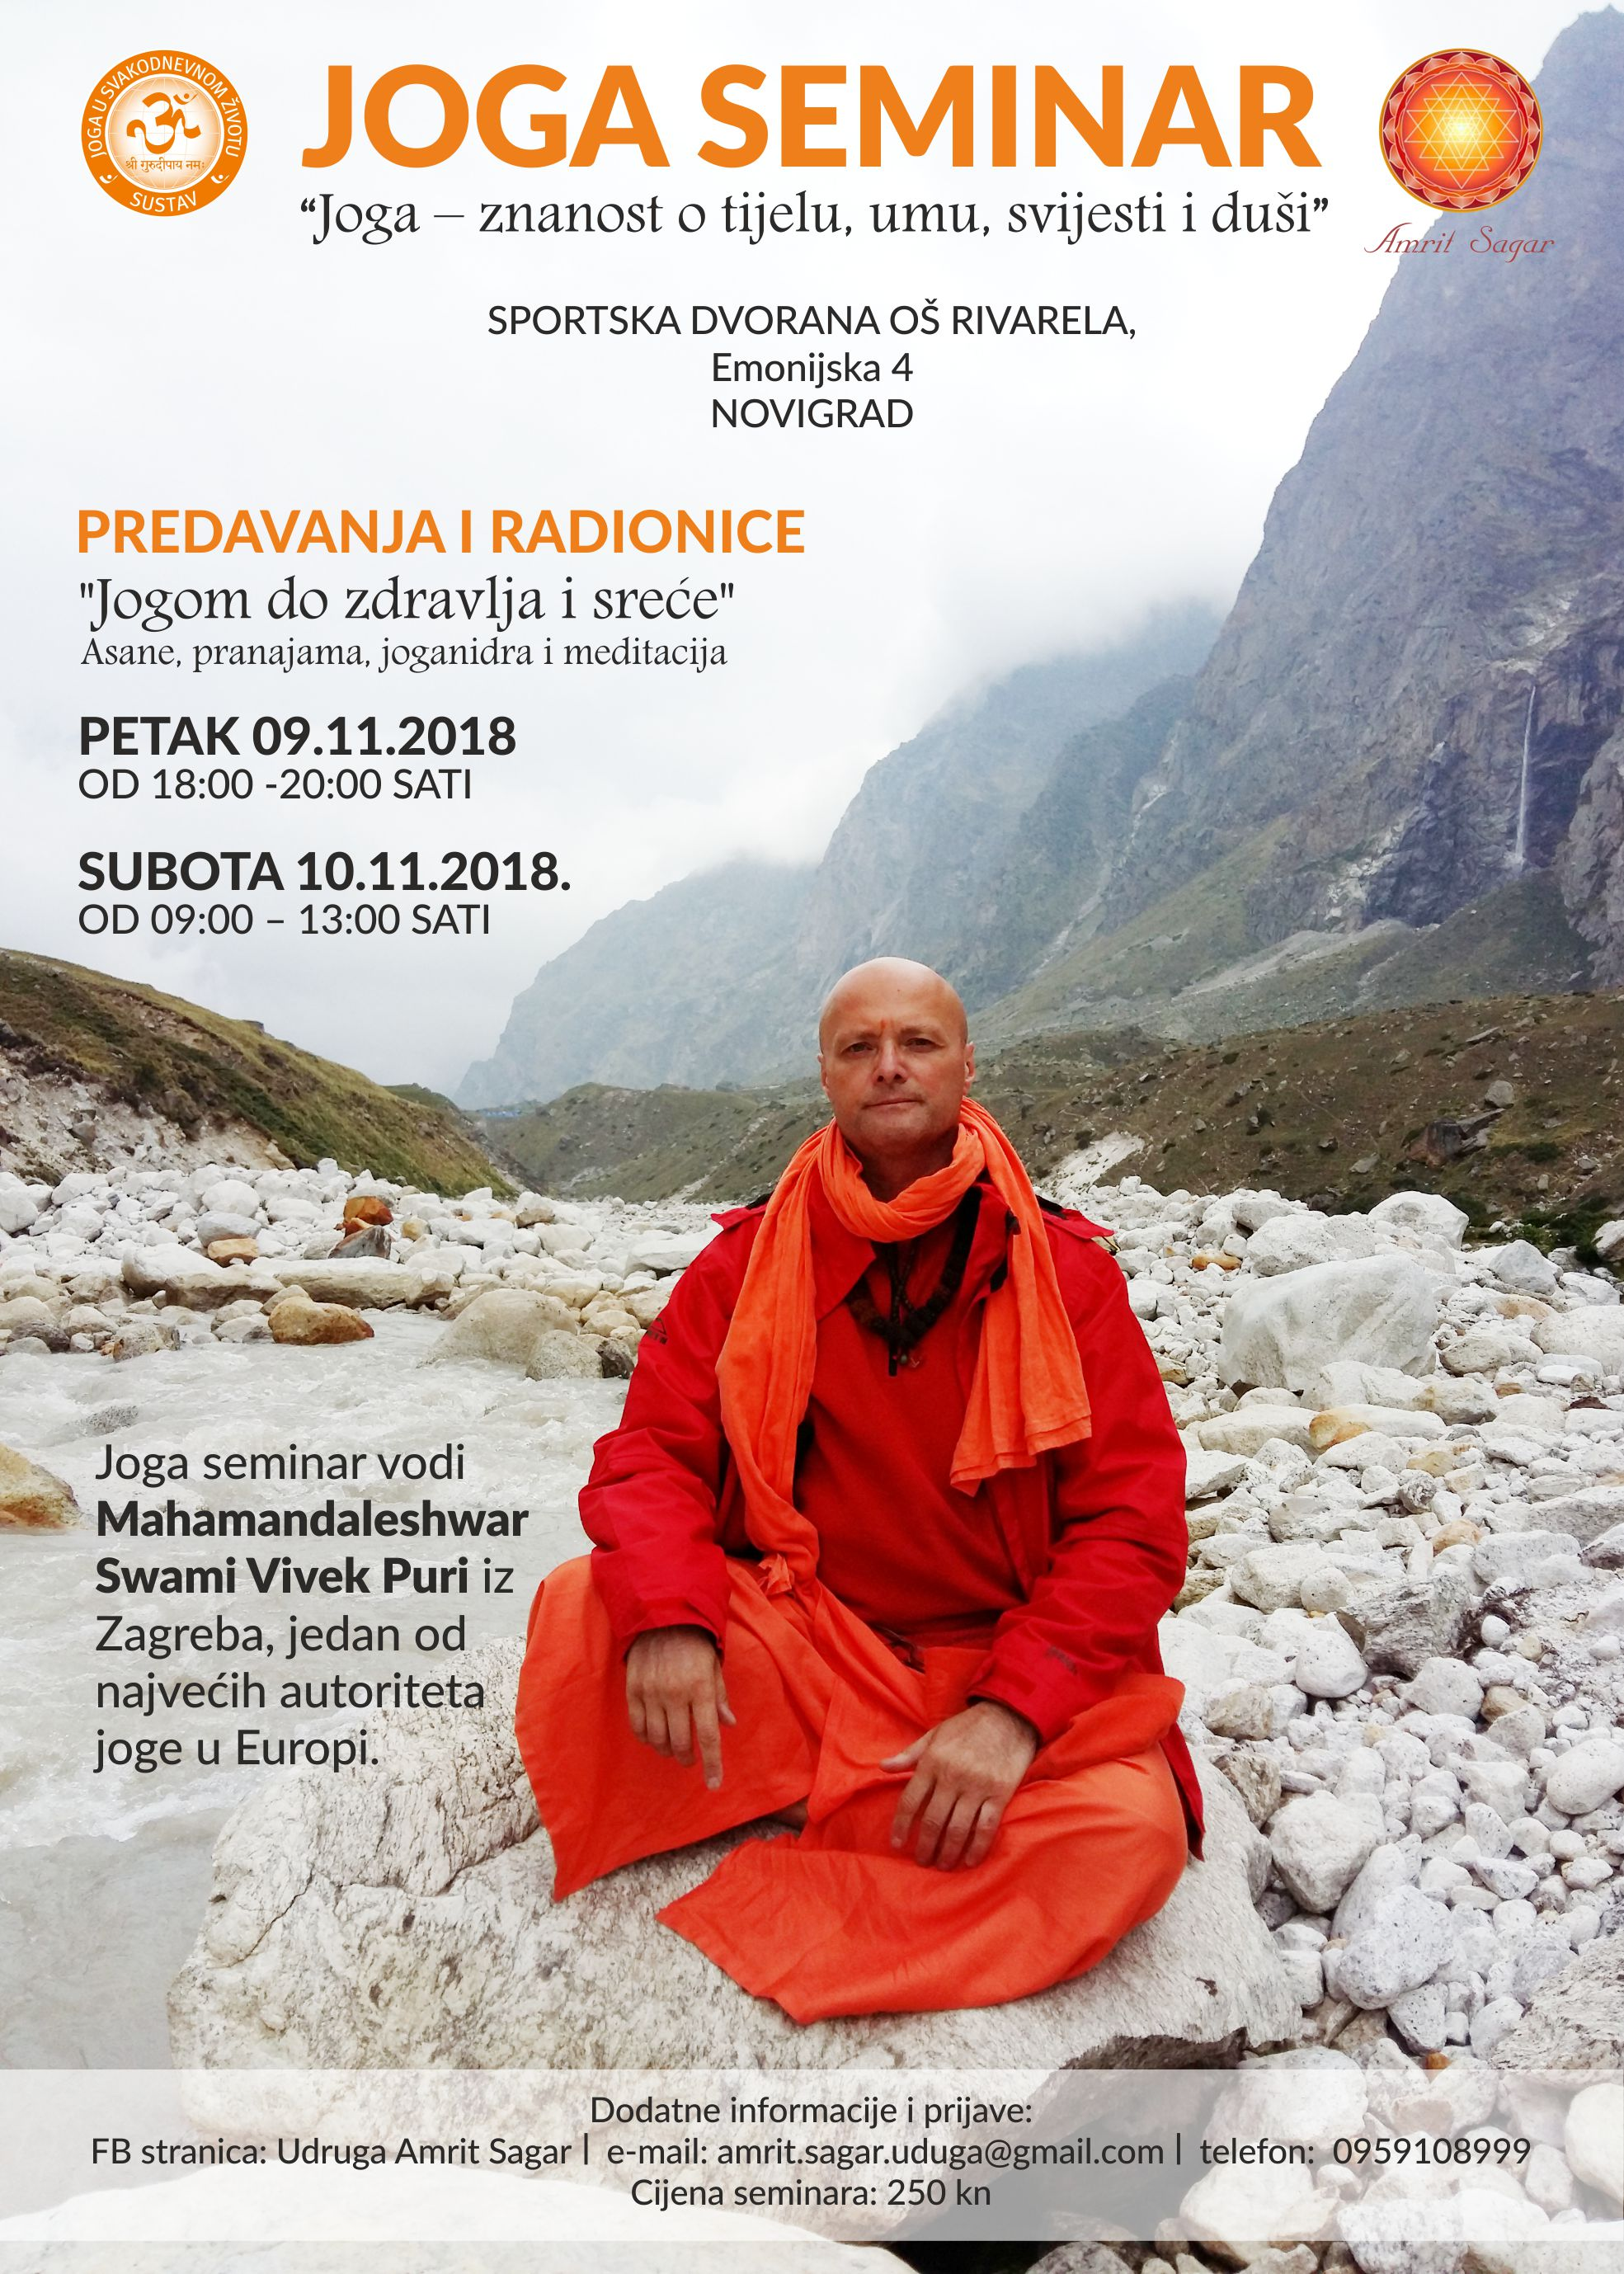 https://novigrad.hr/joga_seminar_predavanja_i_radionice_jogom_do_zdravlja_i_sree